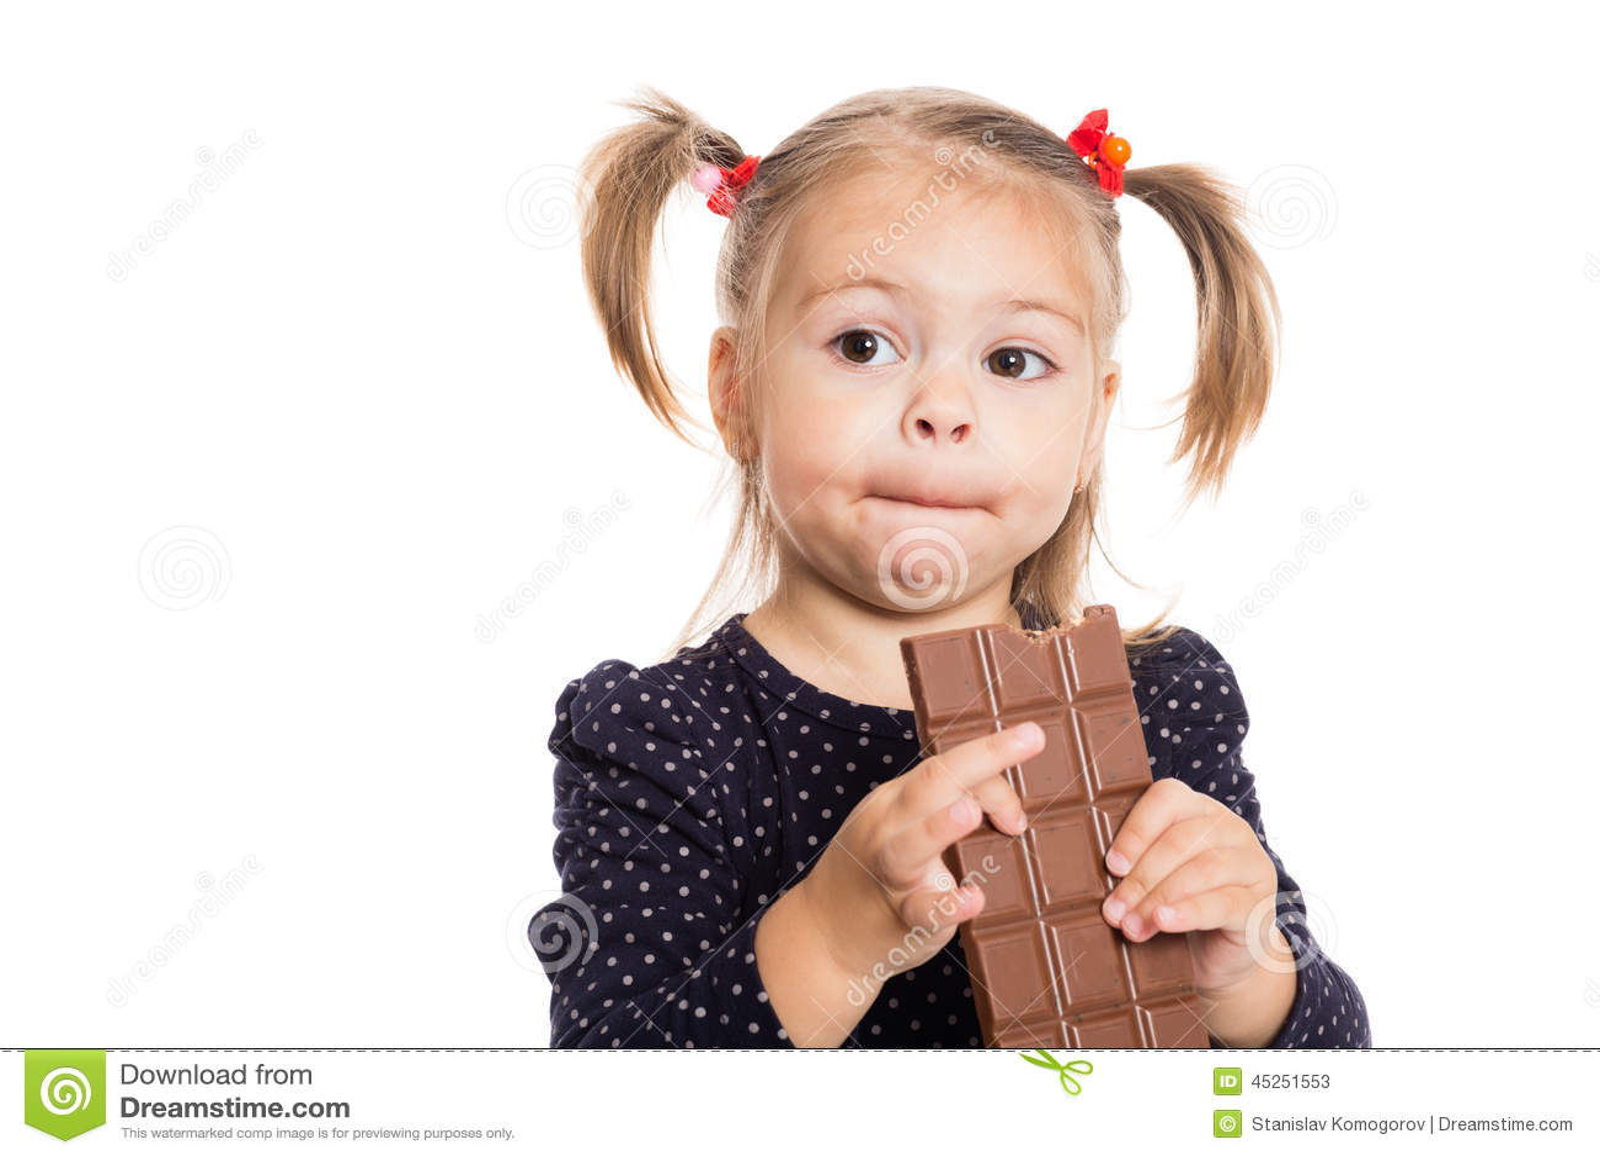 la fille avec plaisir mange du chocolat photo stock image 45251553. Black Bedroom Furniture Sets. Home Design Ideas